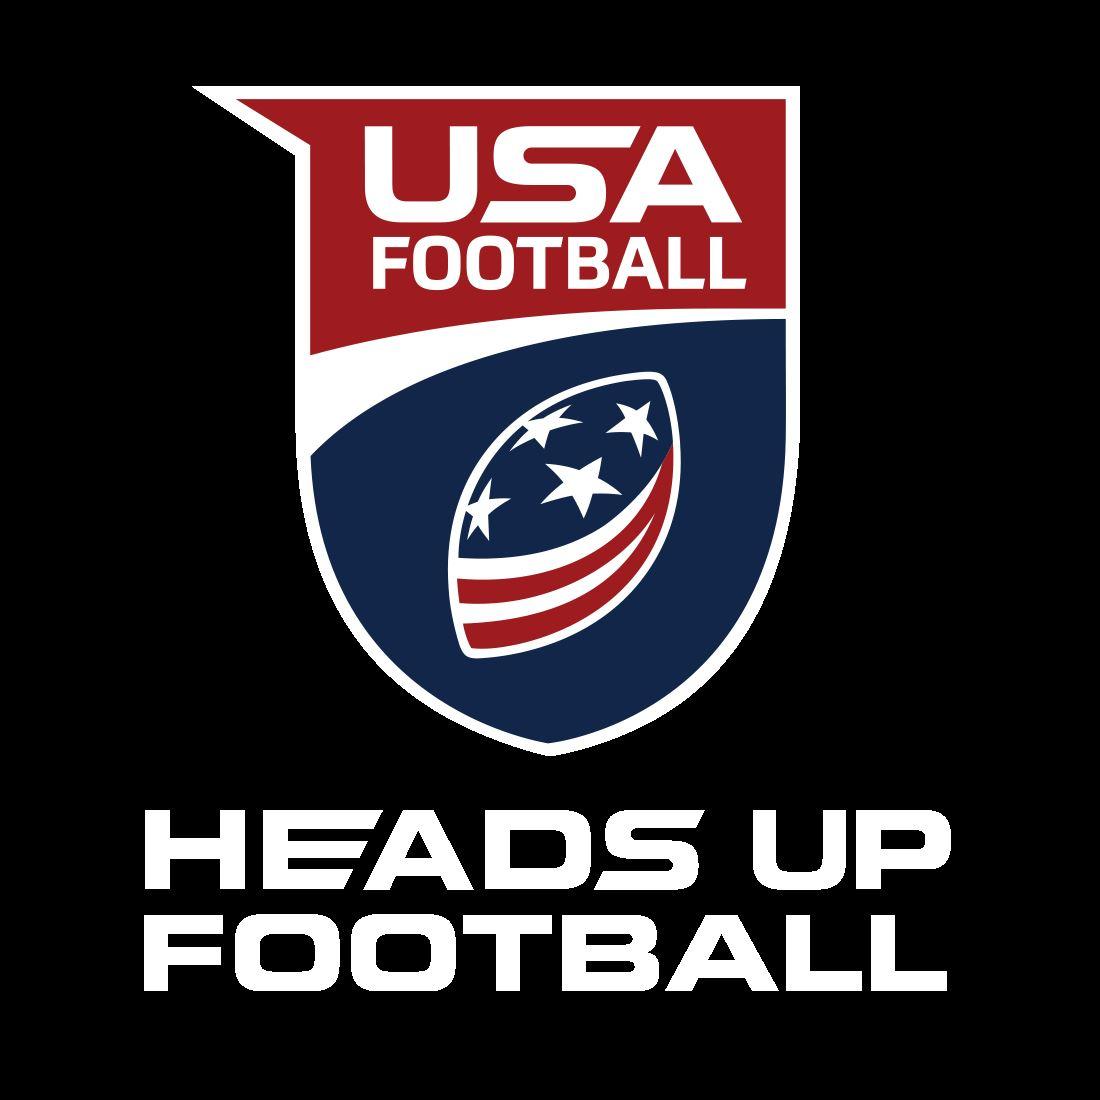 USA Football - Heads Up Football